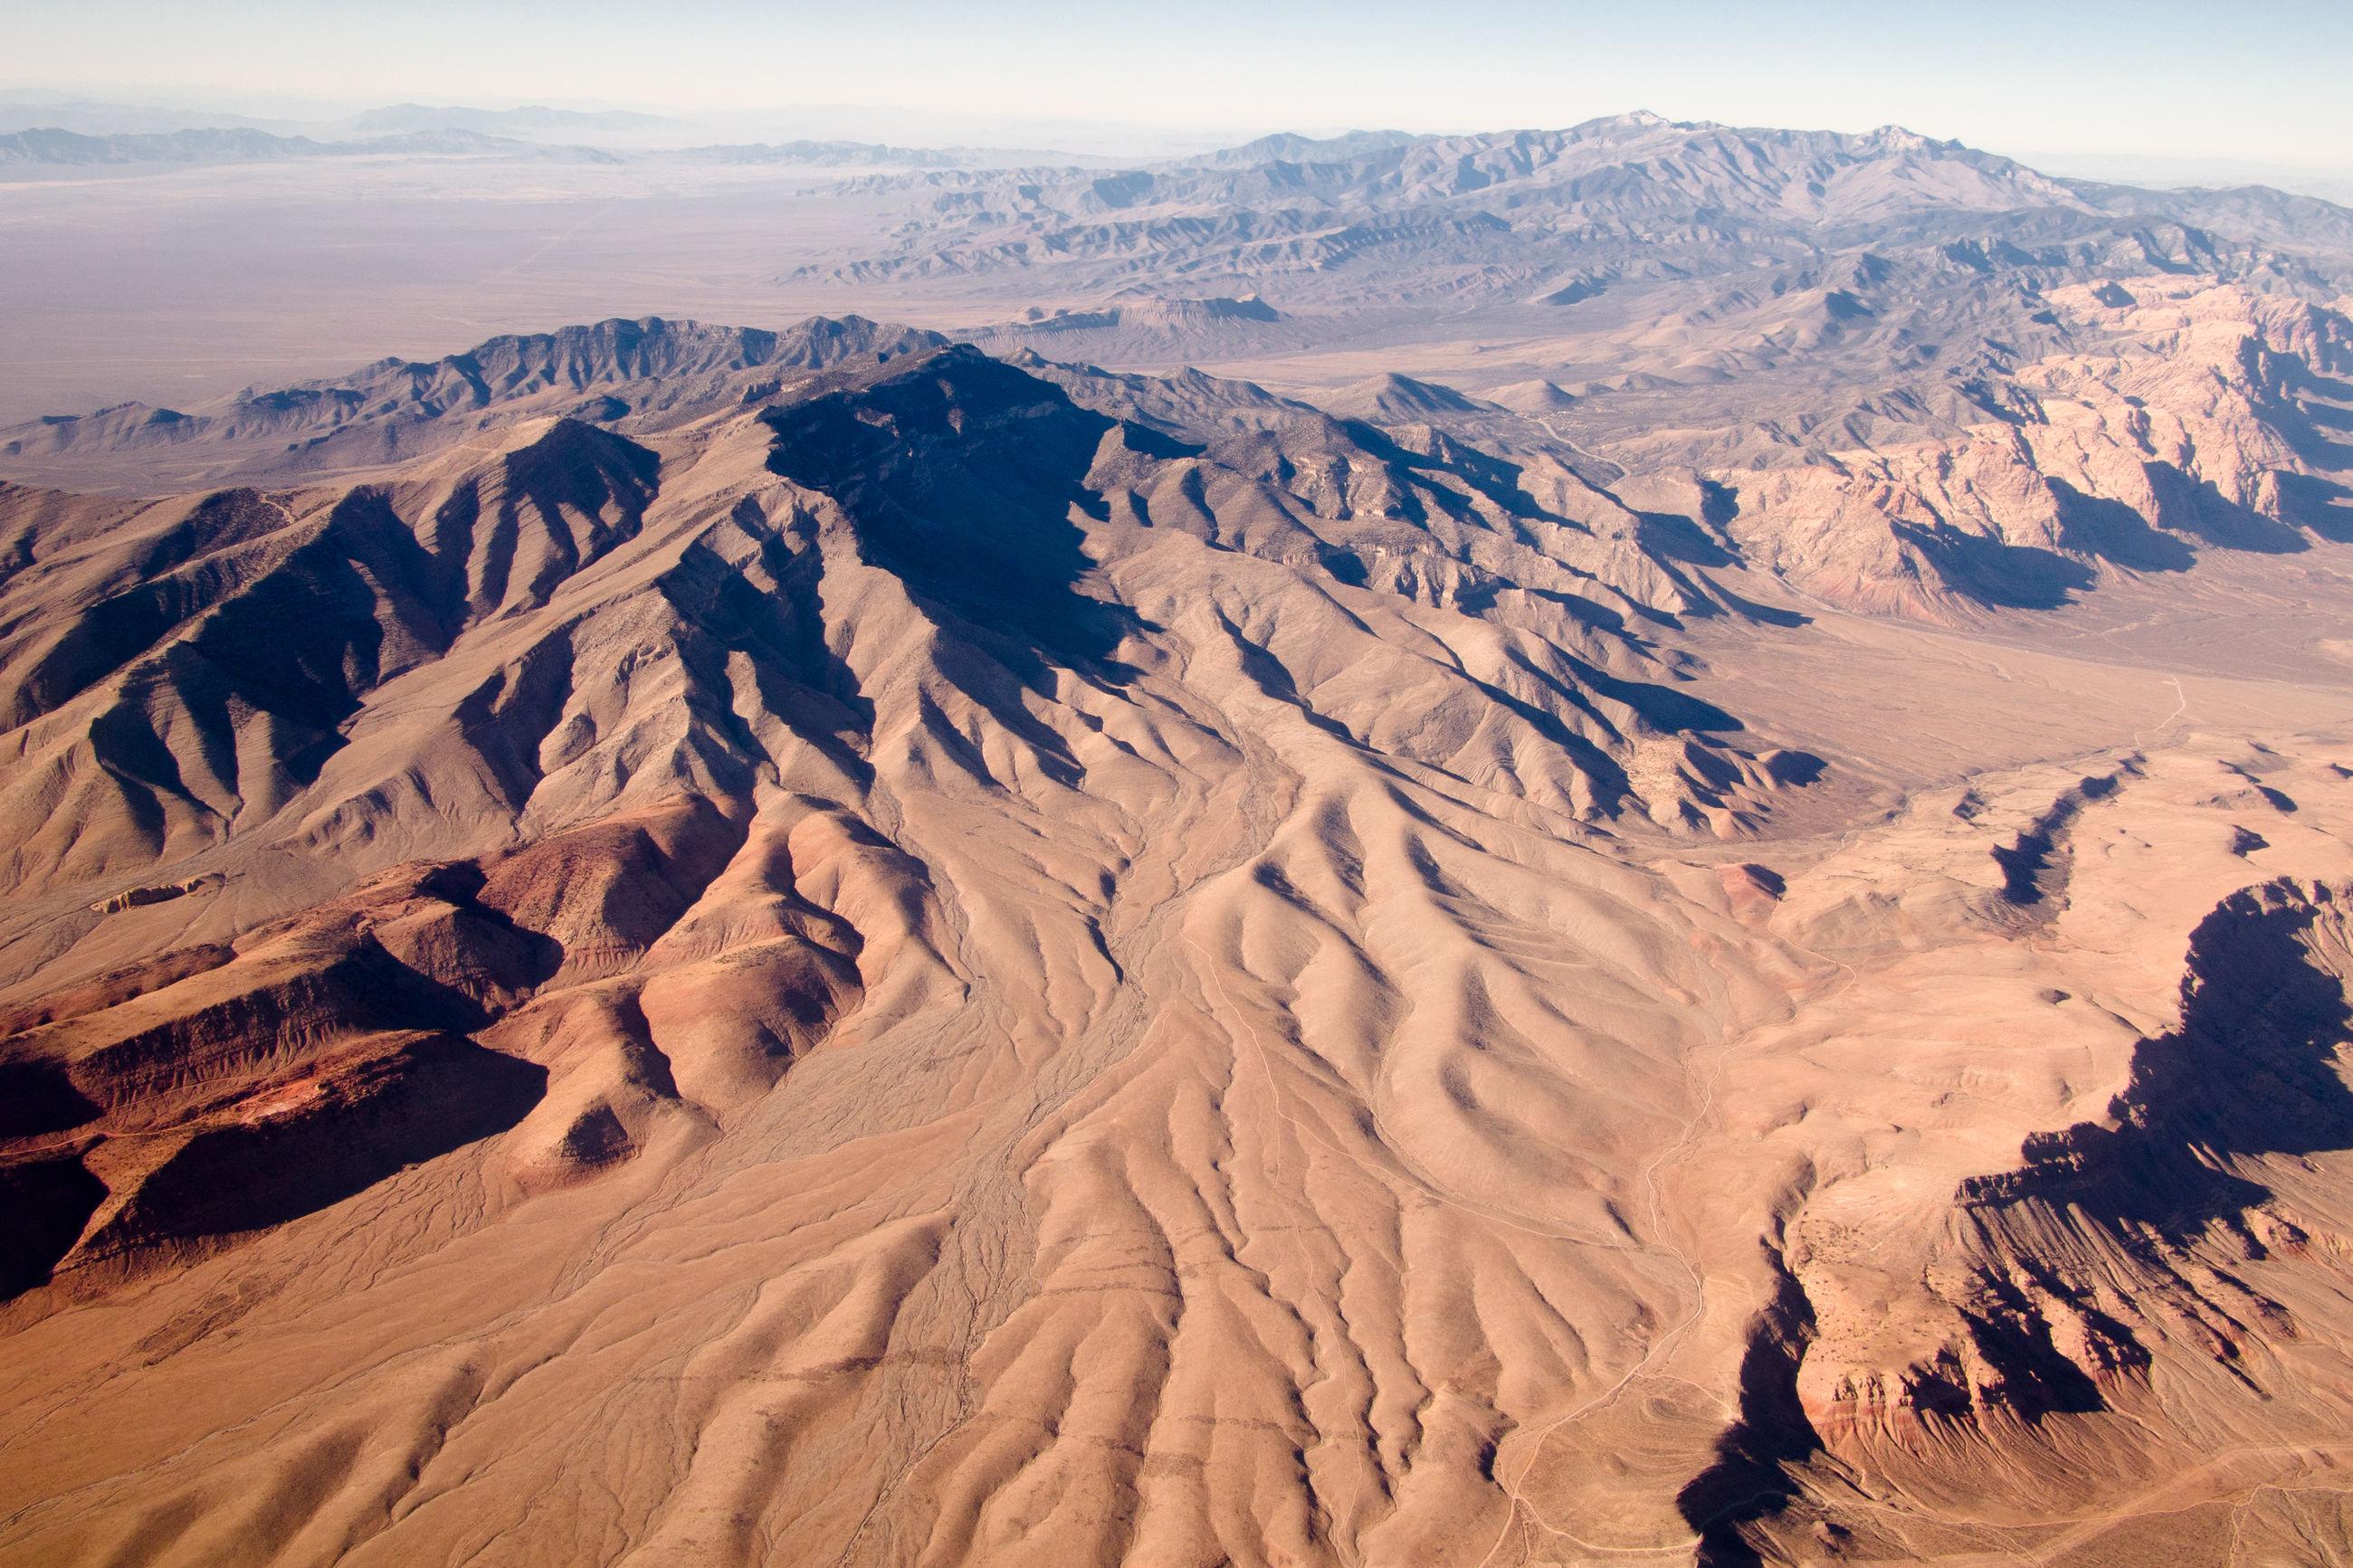 View of deserted landscape